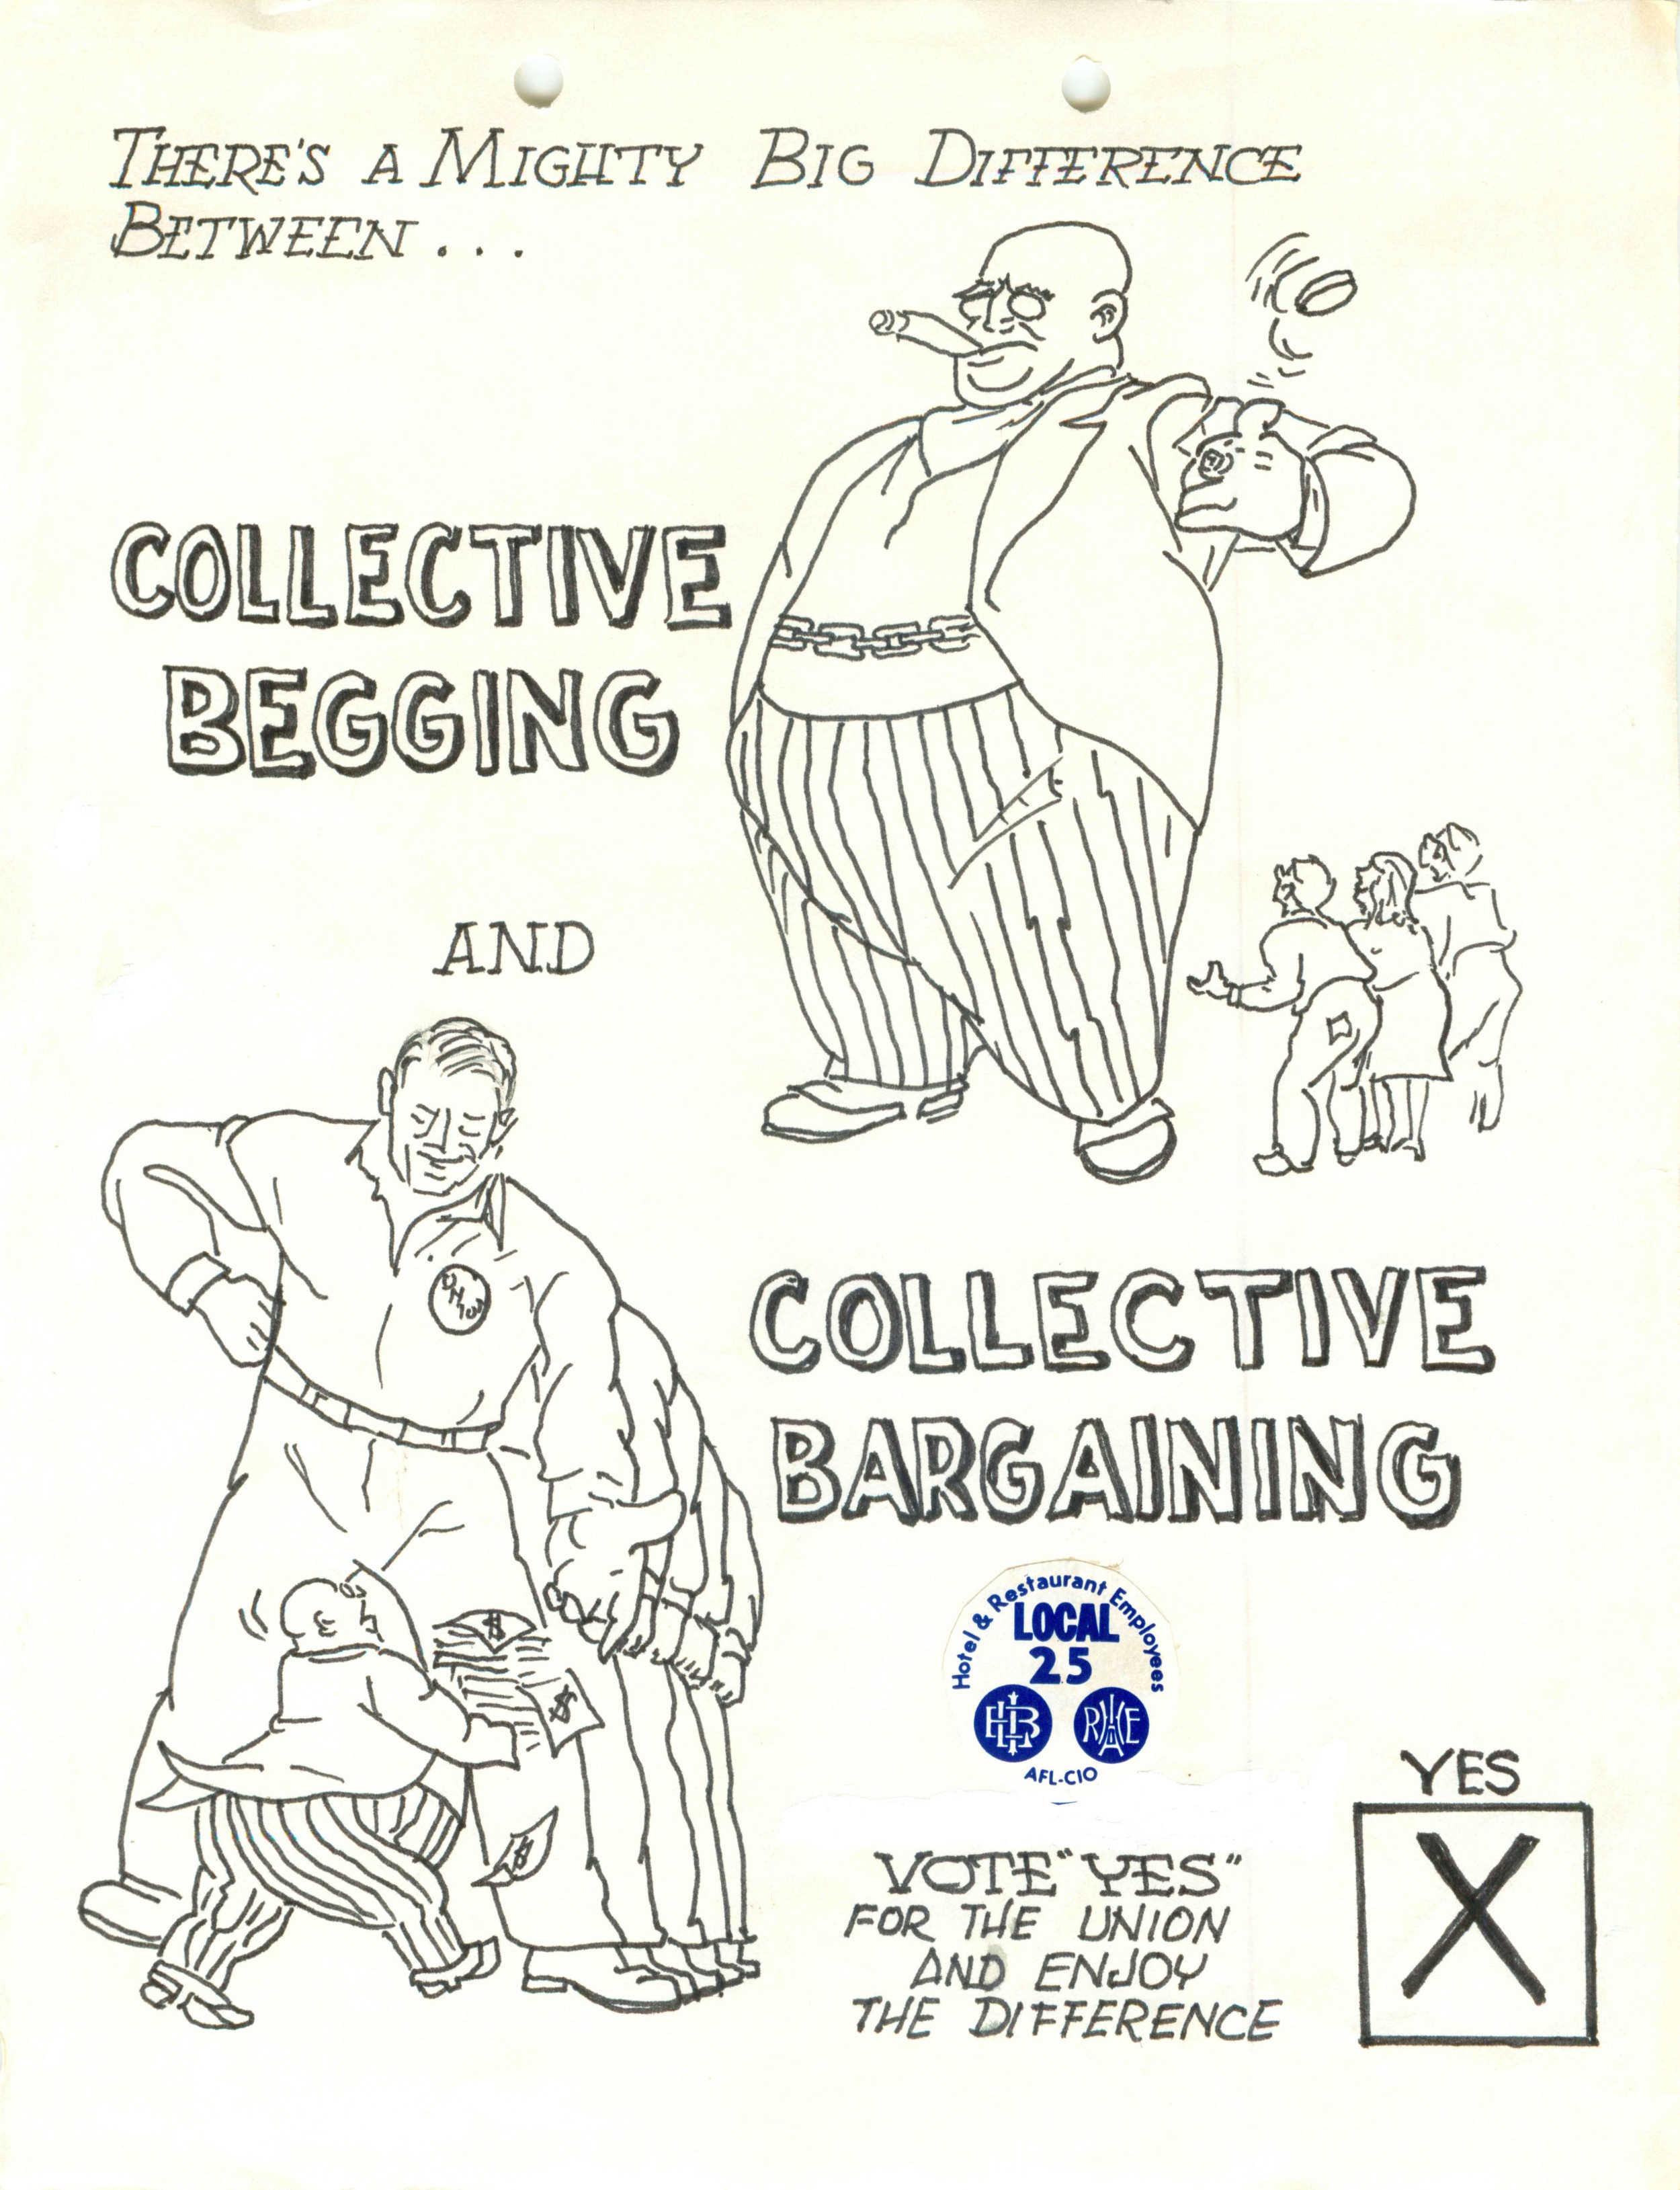 Richardson Days_CollectiveBeggingandBargaining.jpg